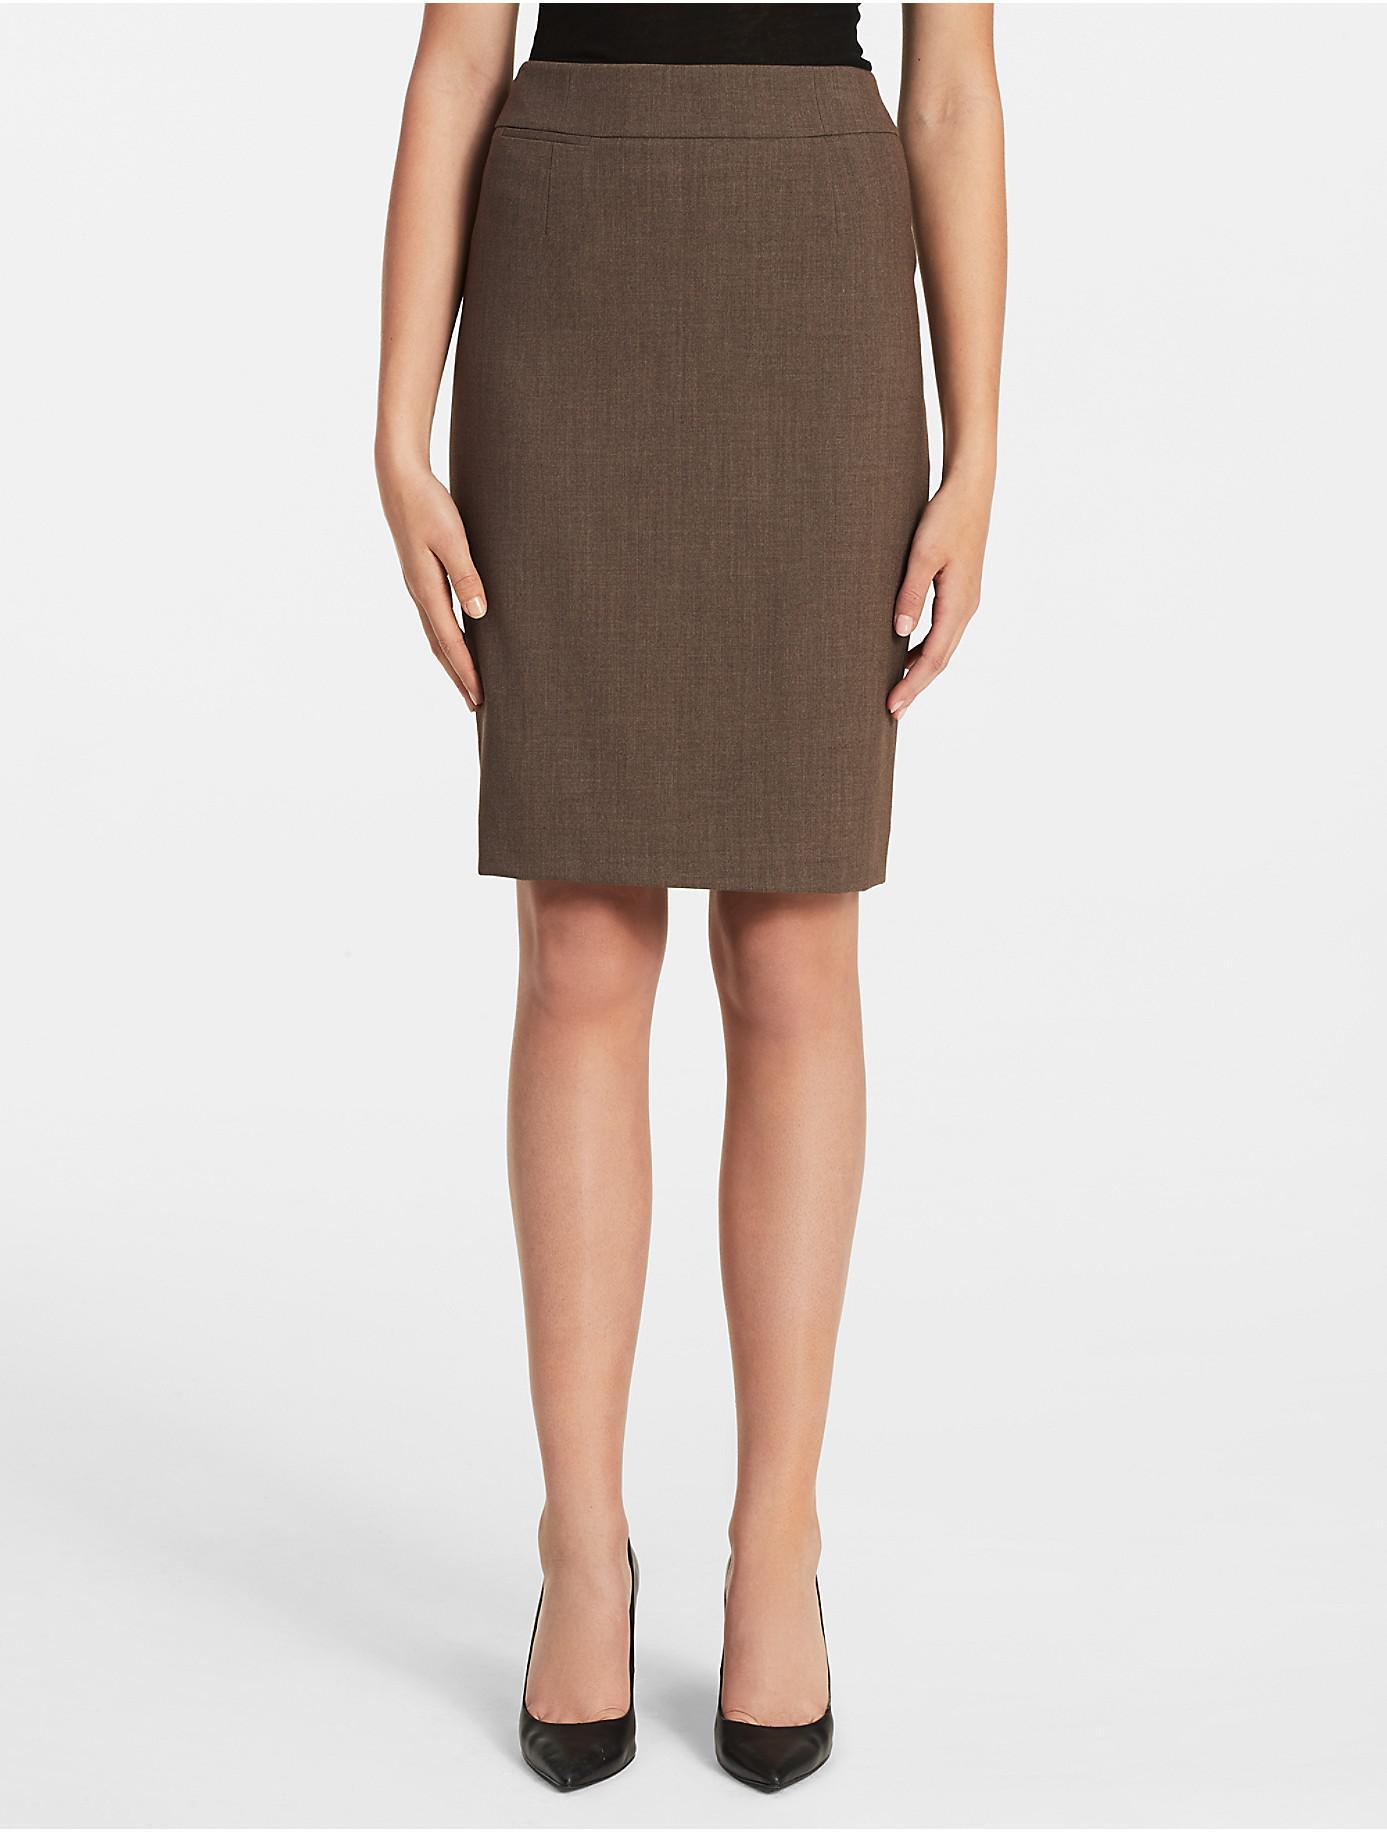 3627d6157784a Lyst - Calvin Klein Straight Pencil Cream Suit Skirt in Brown